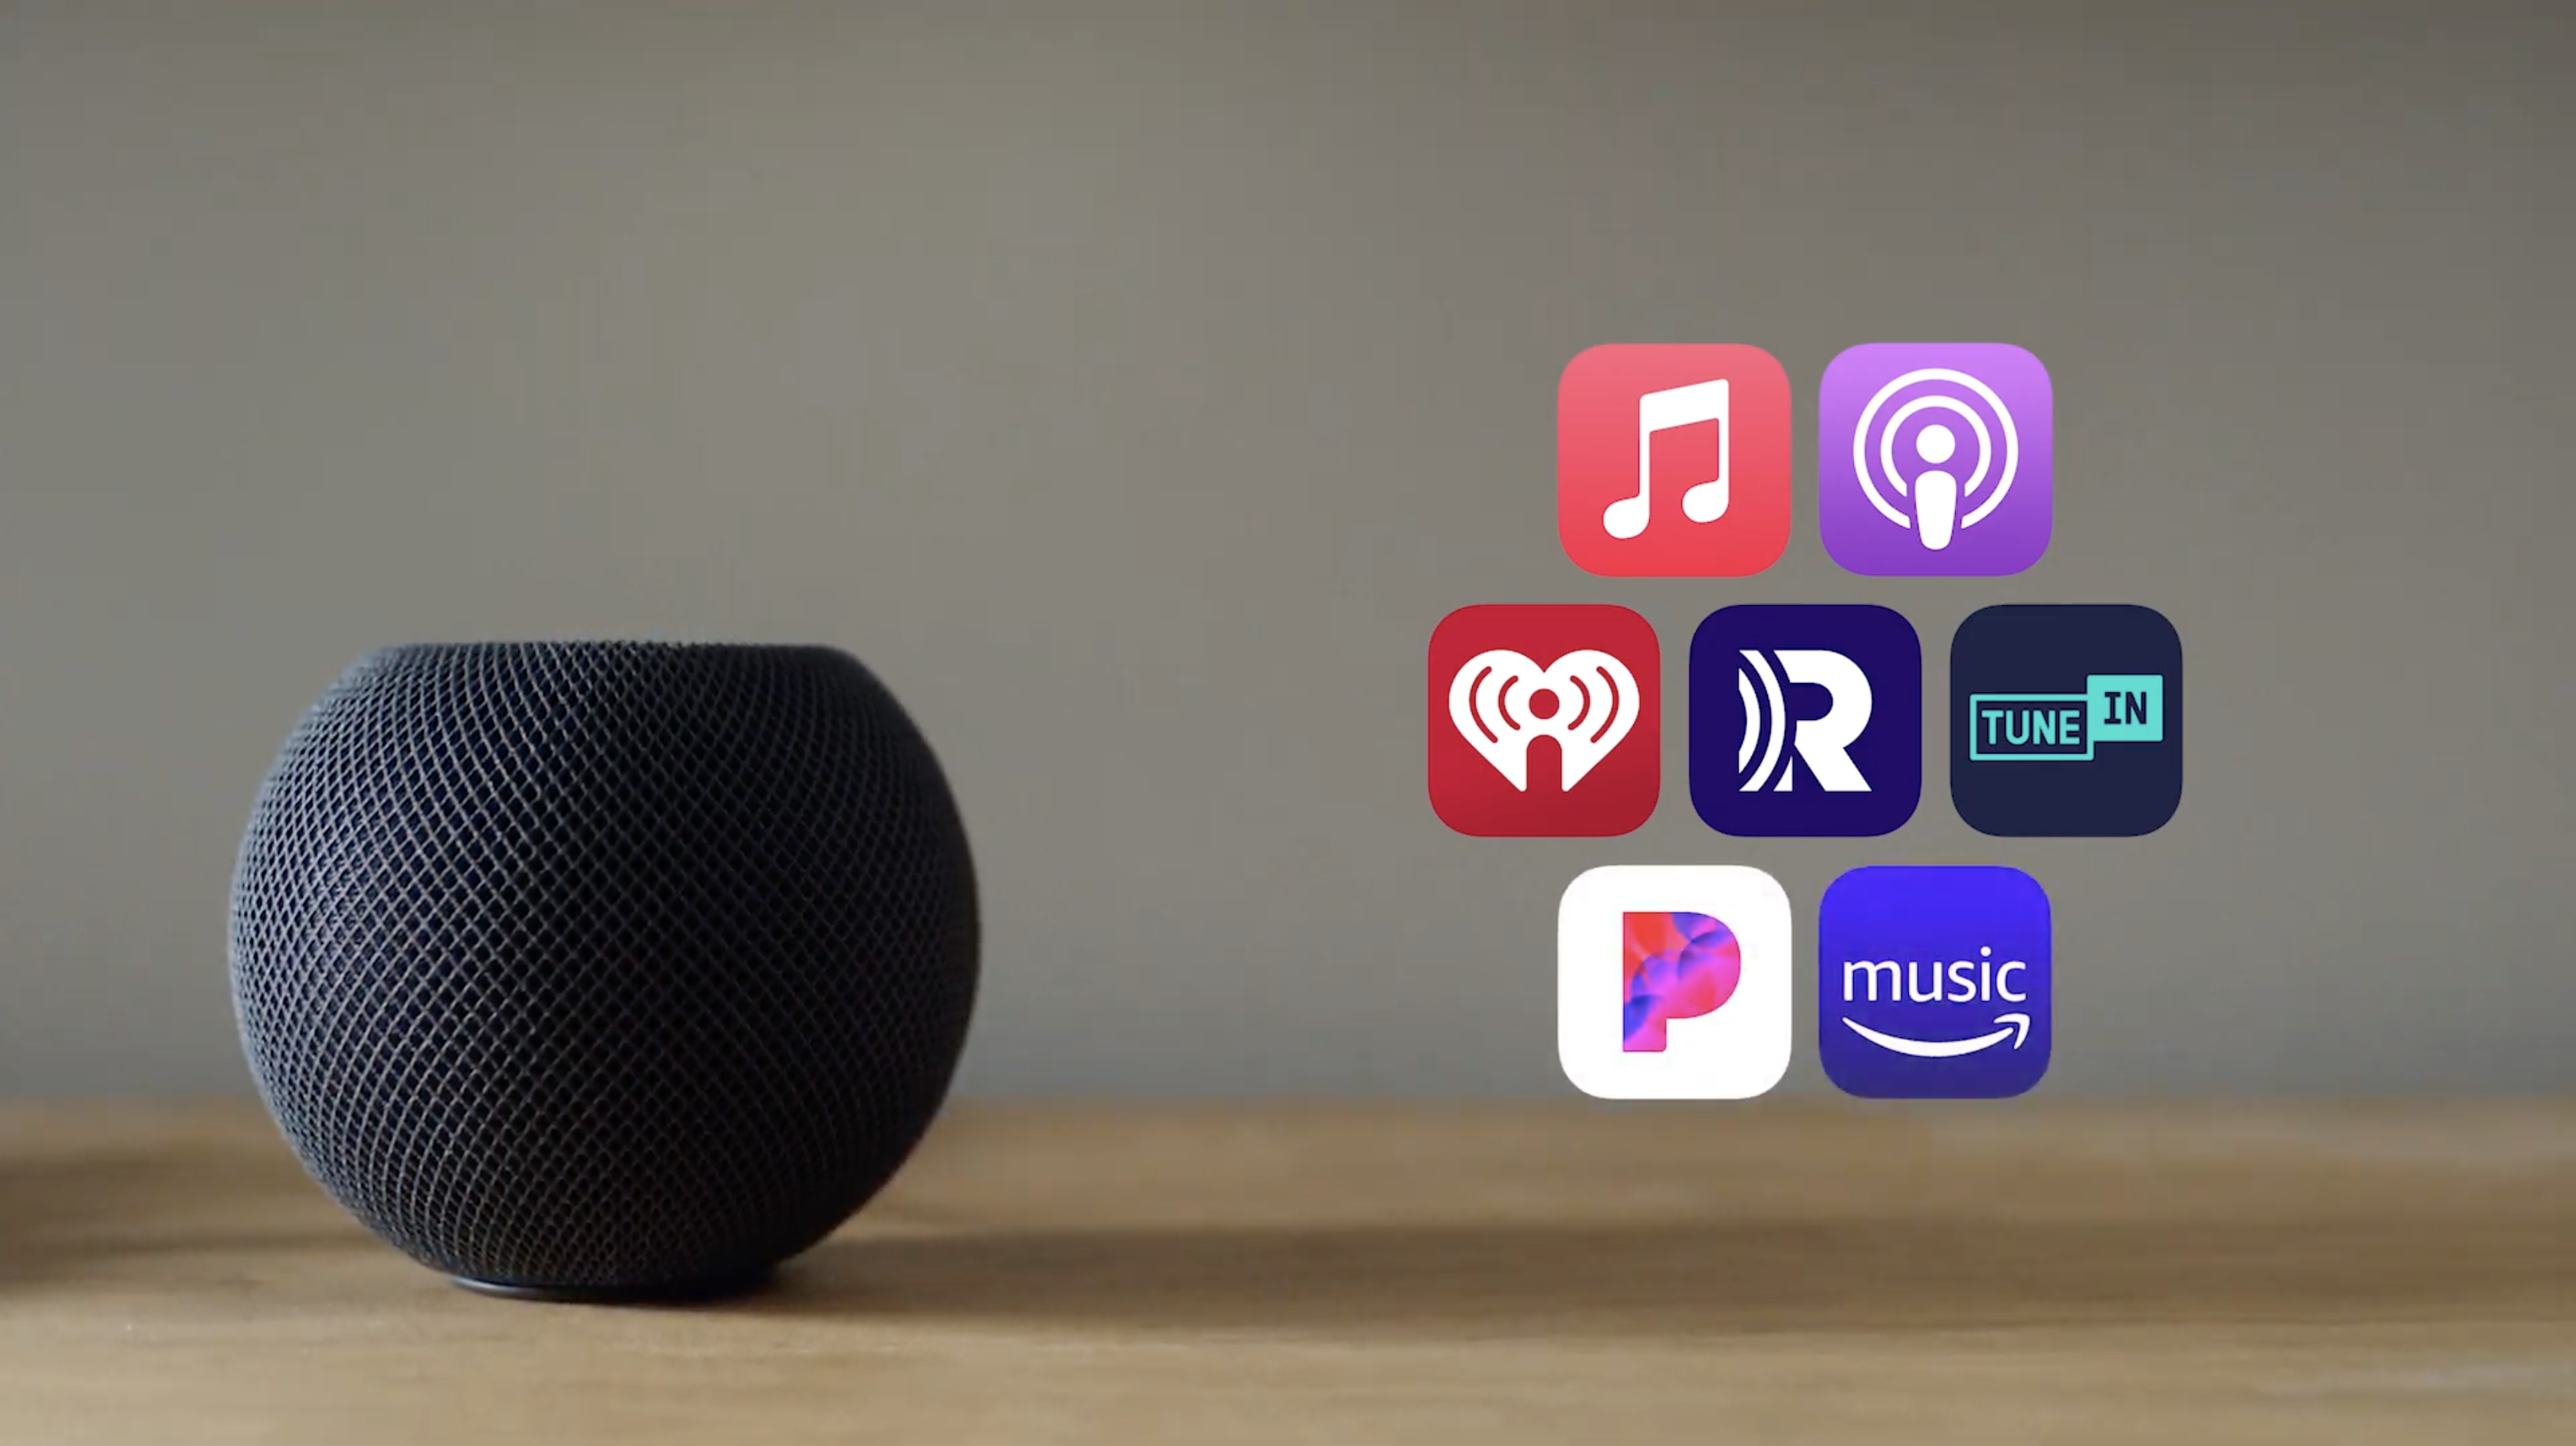 Apple Event Homepod mini